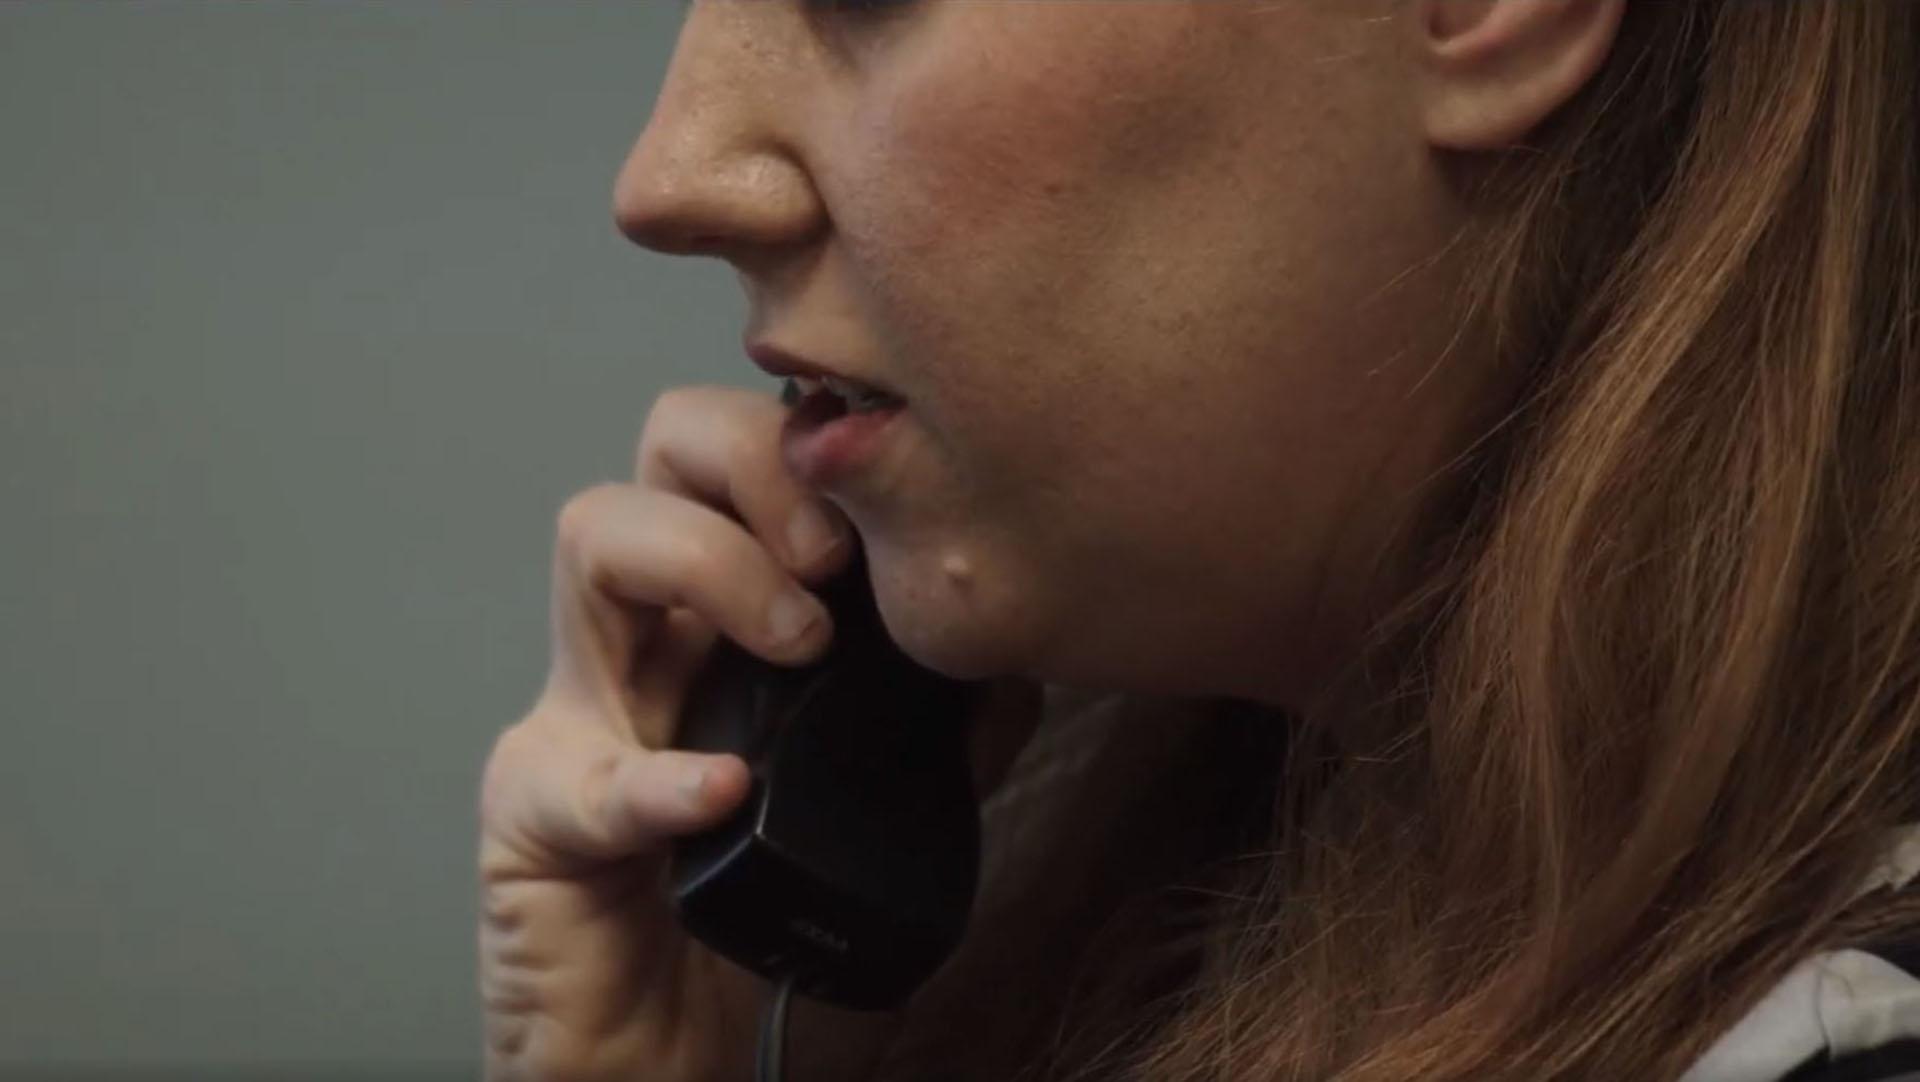 ACTS Helpline, Senior Link offers listening ear to community members